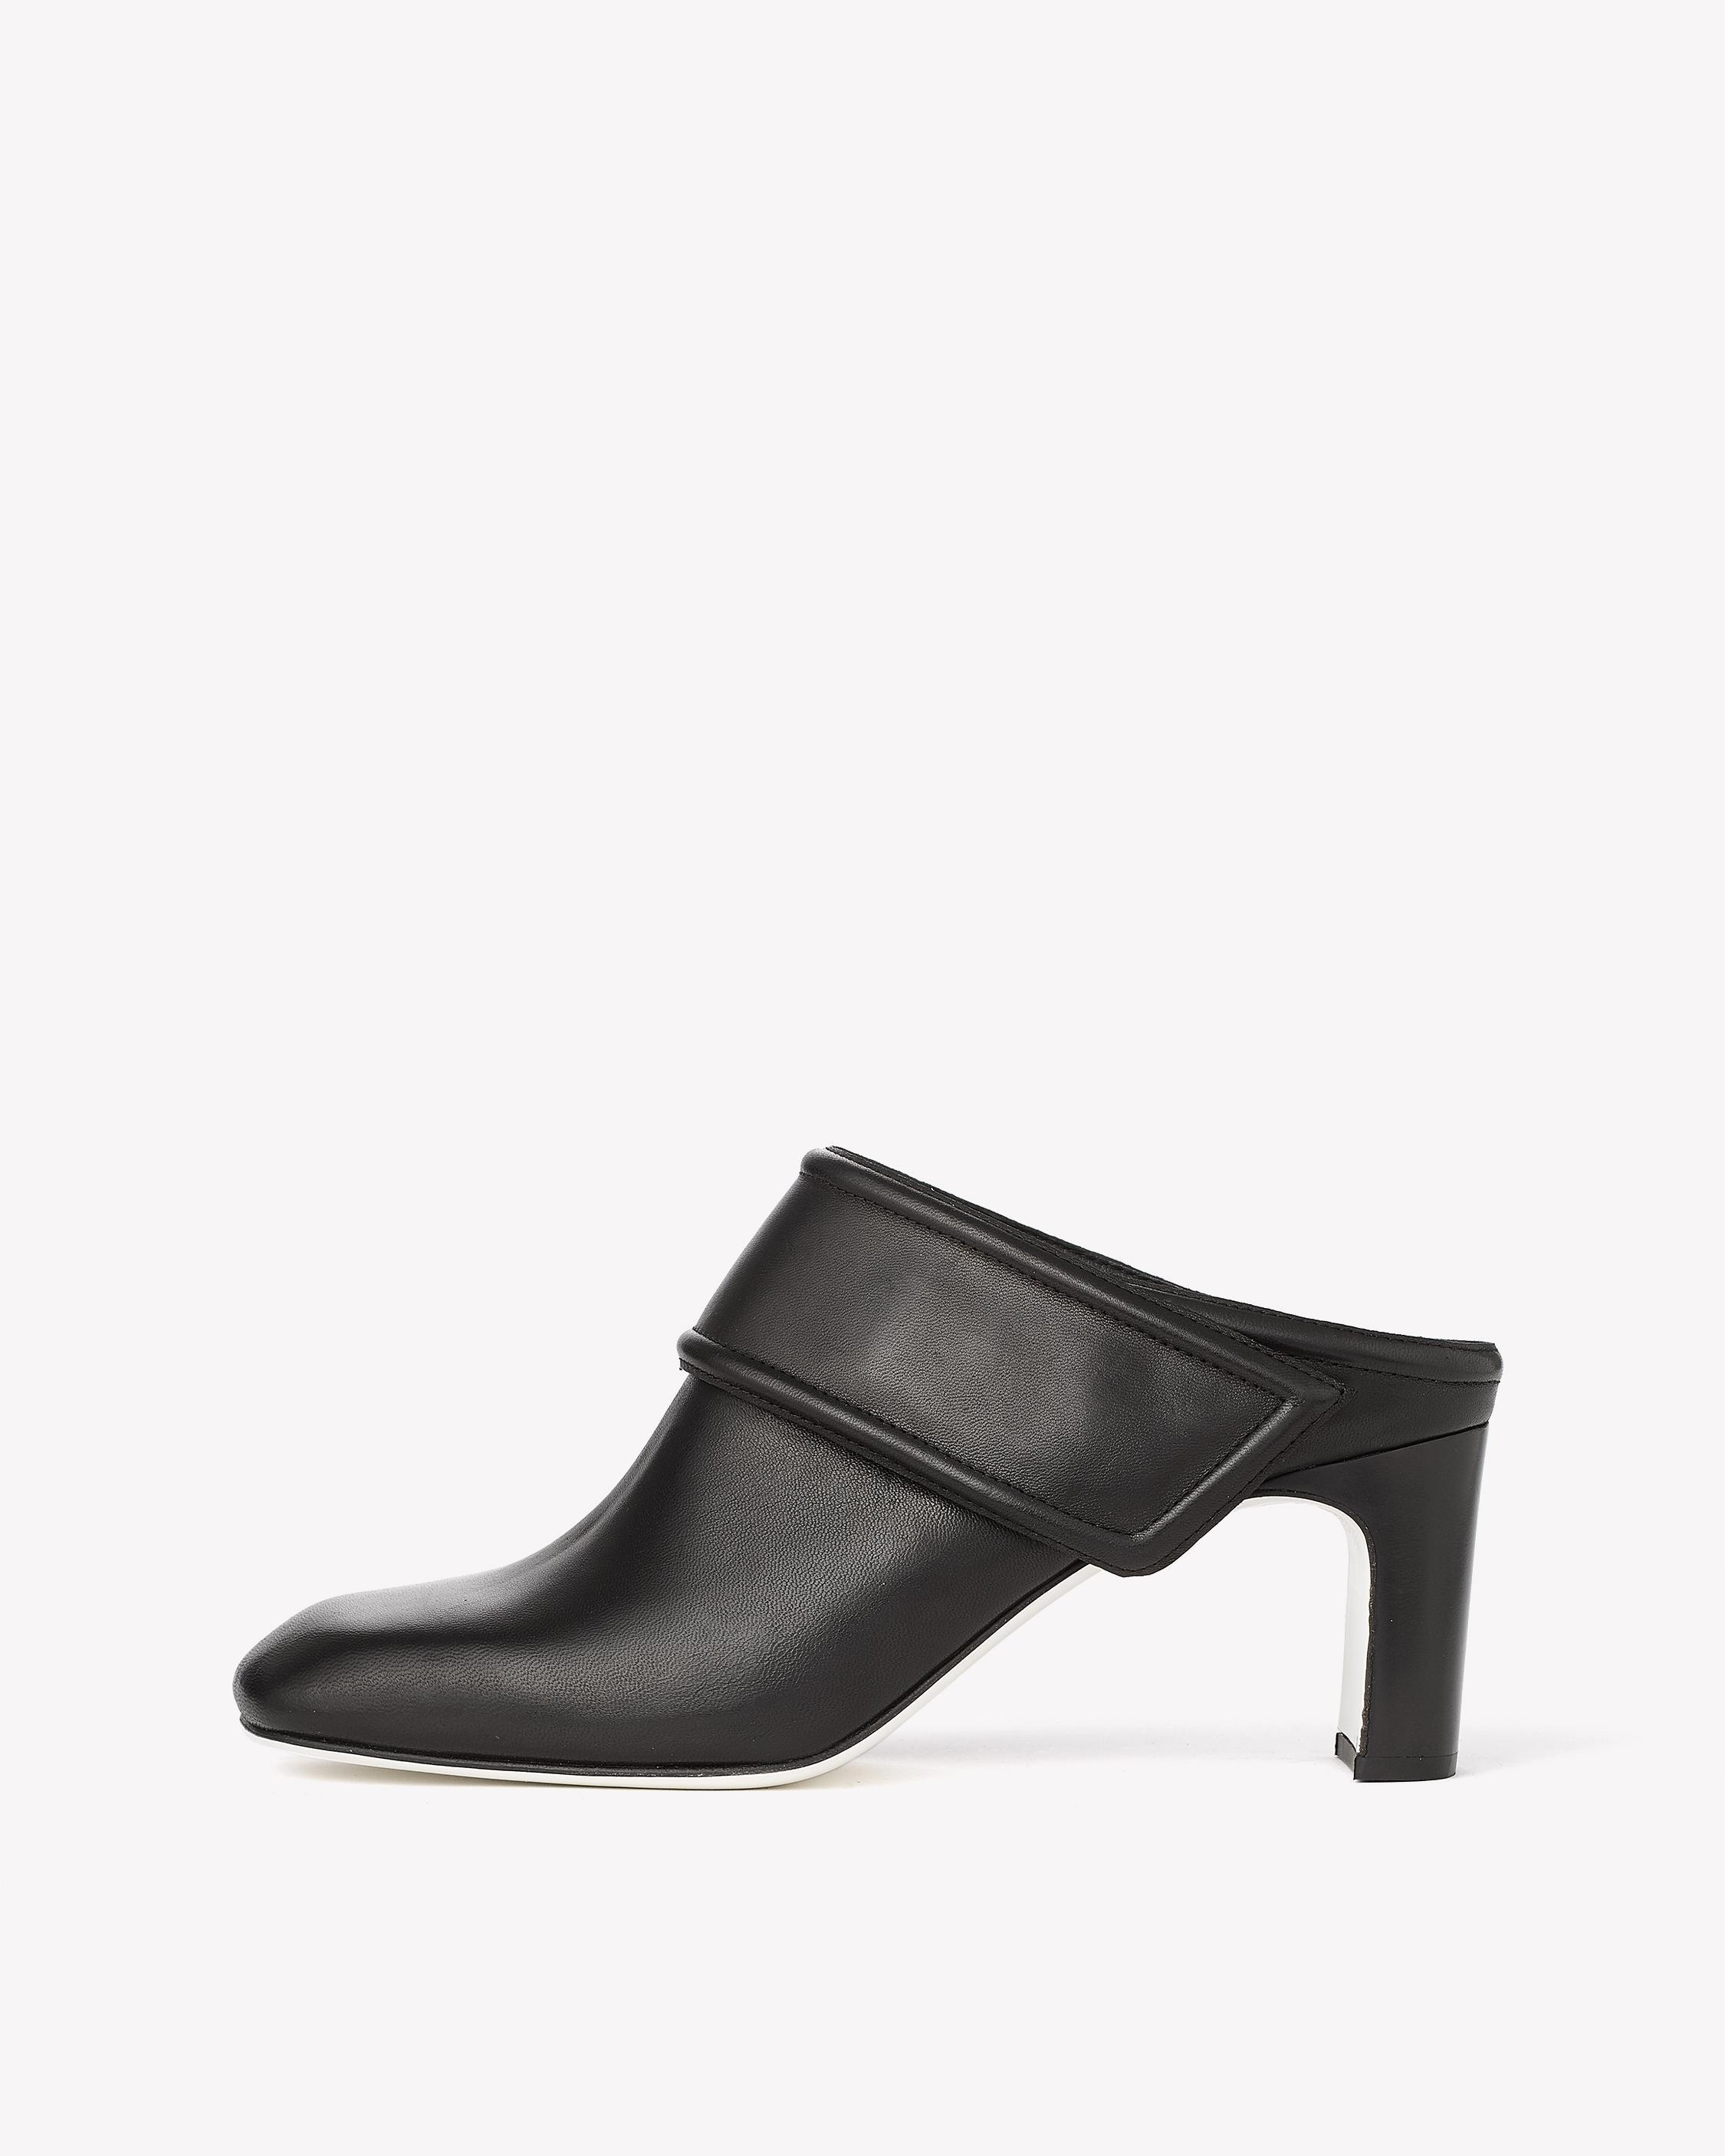 RAG&BONE Leather Heels QzOvki1